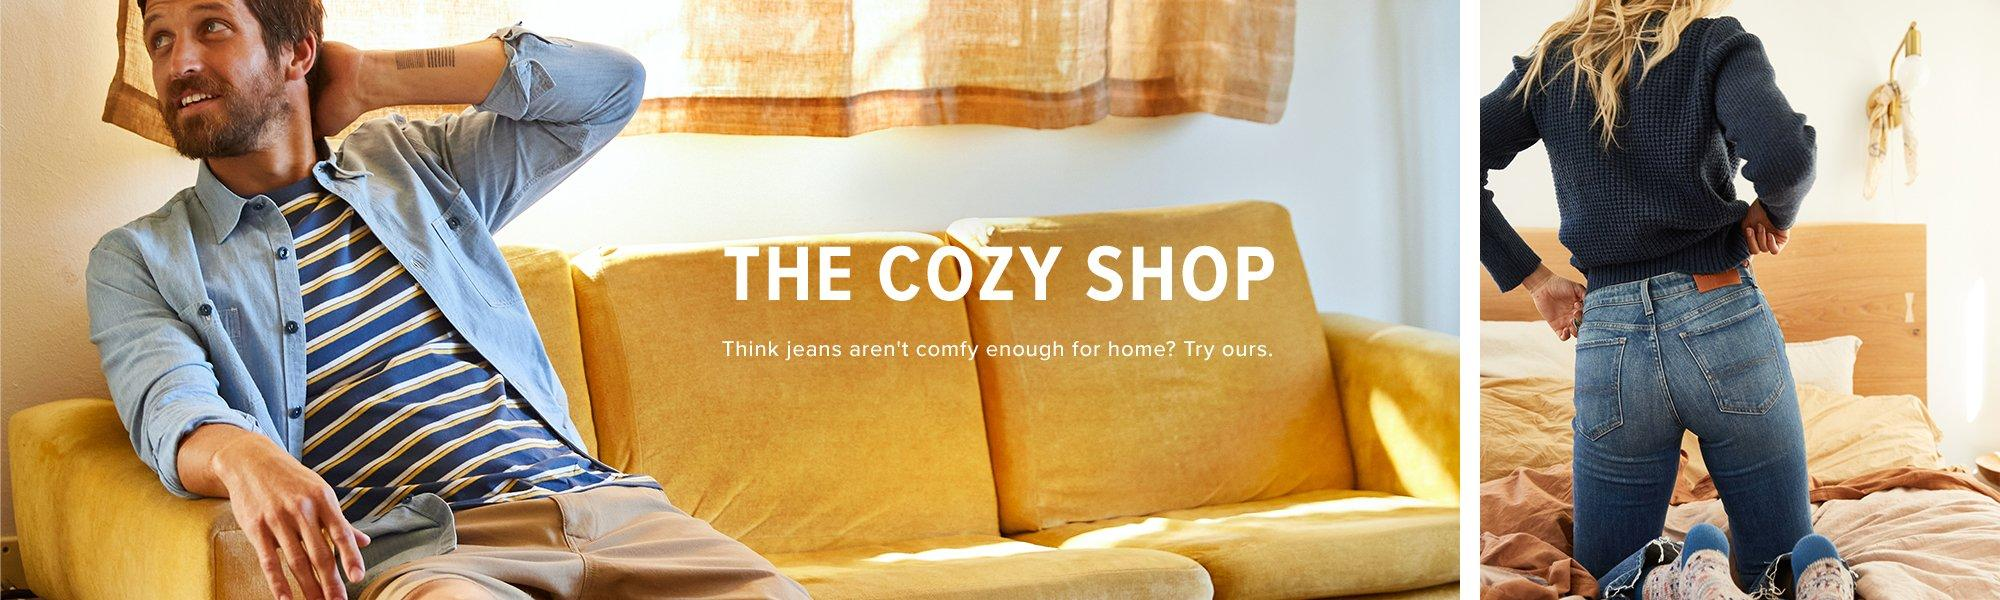 The Cozy Shop